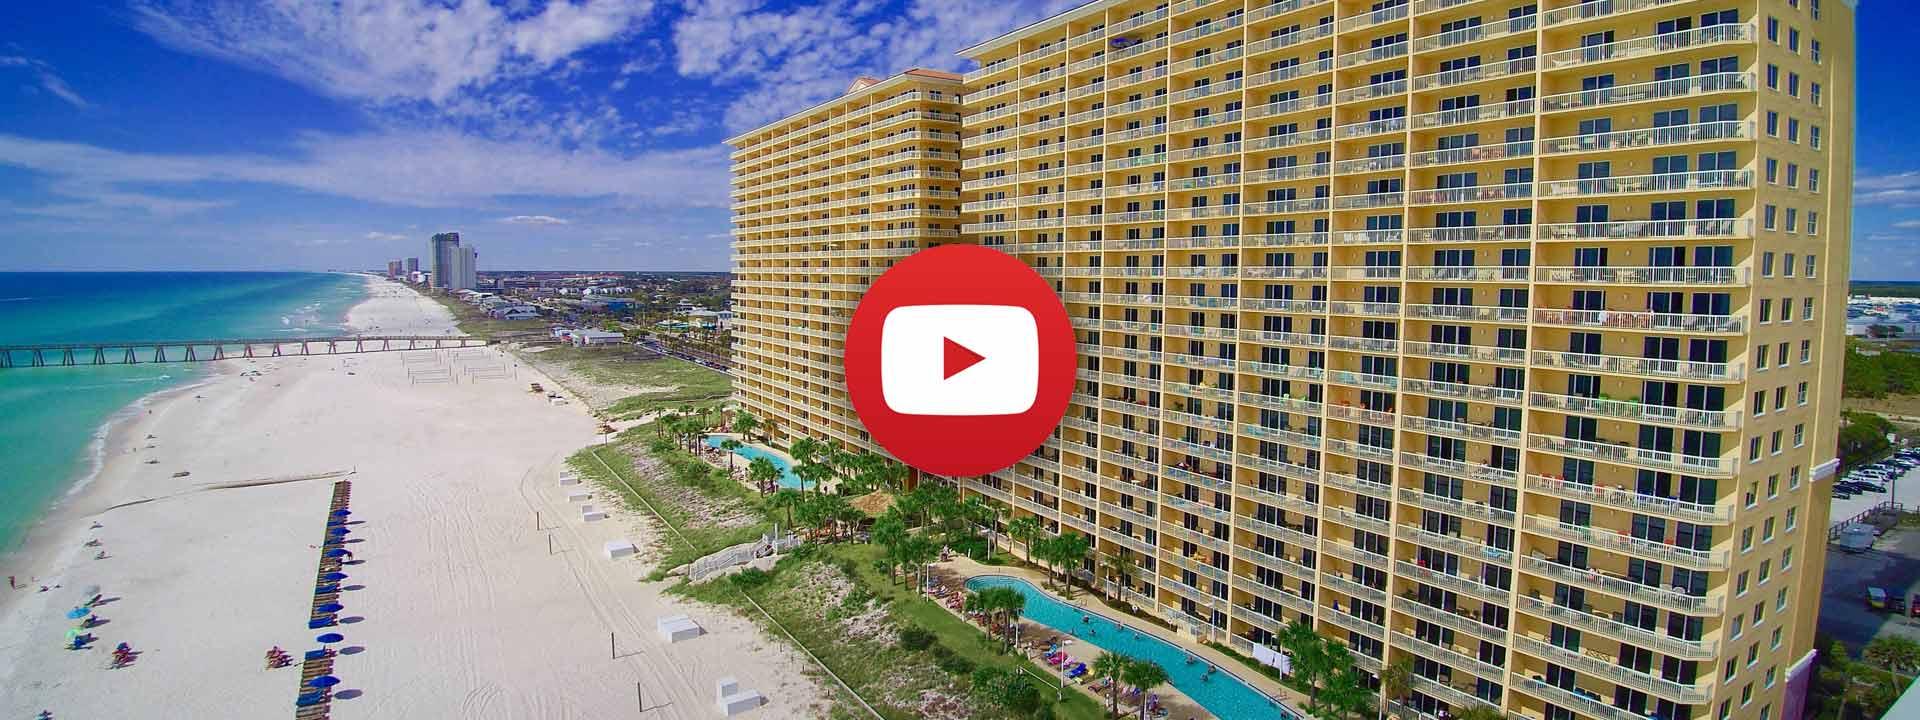 Watch Now Top 6 Panama City Beach Webcams 2019